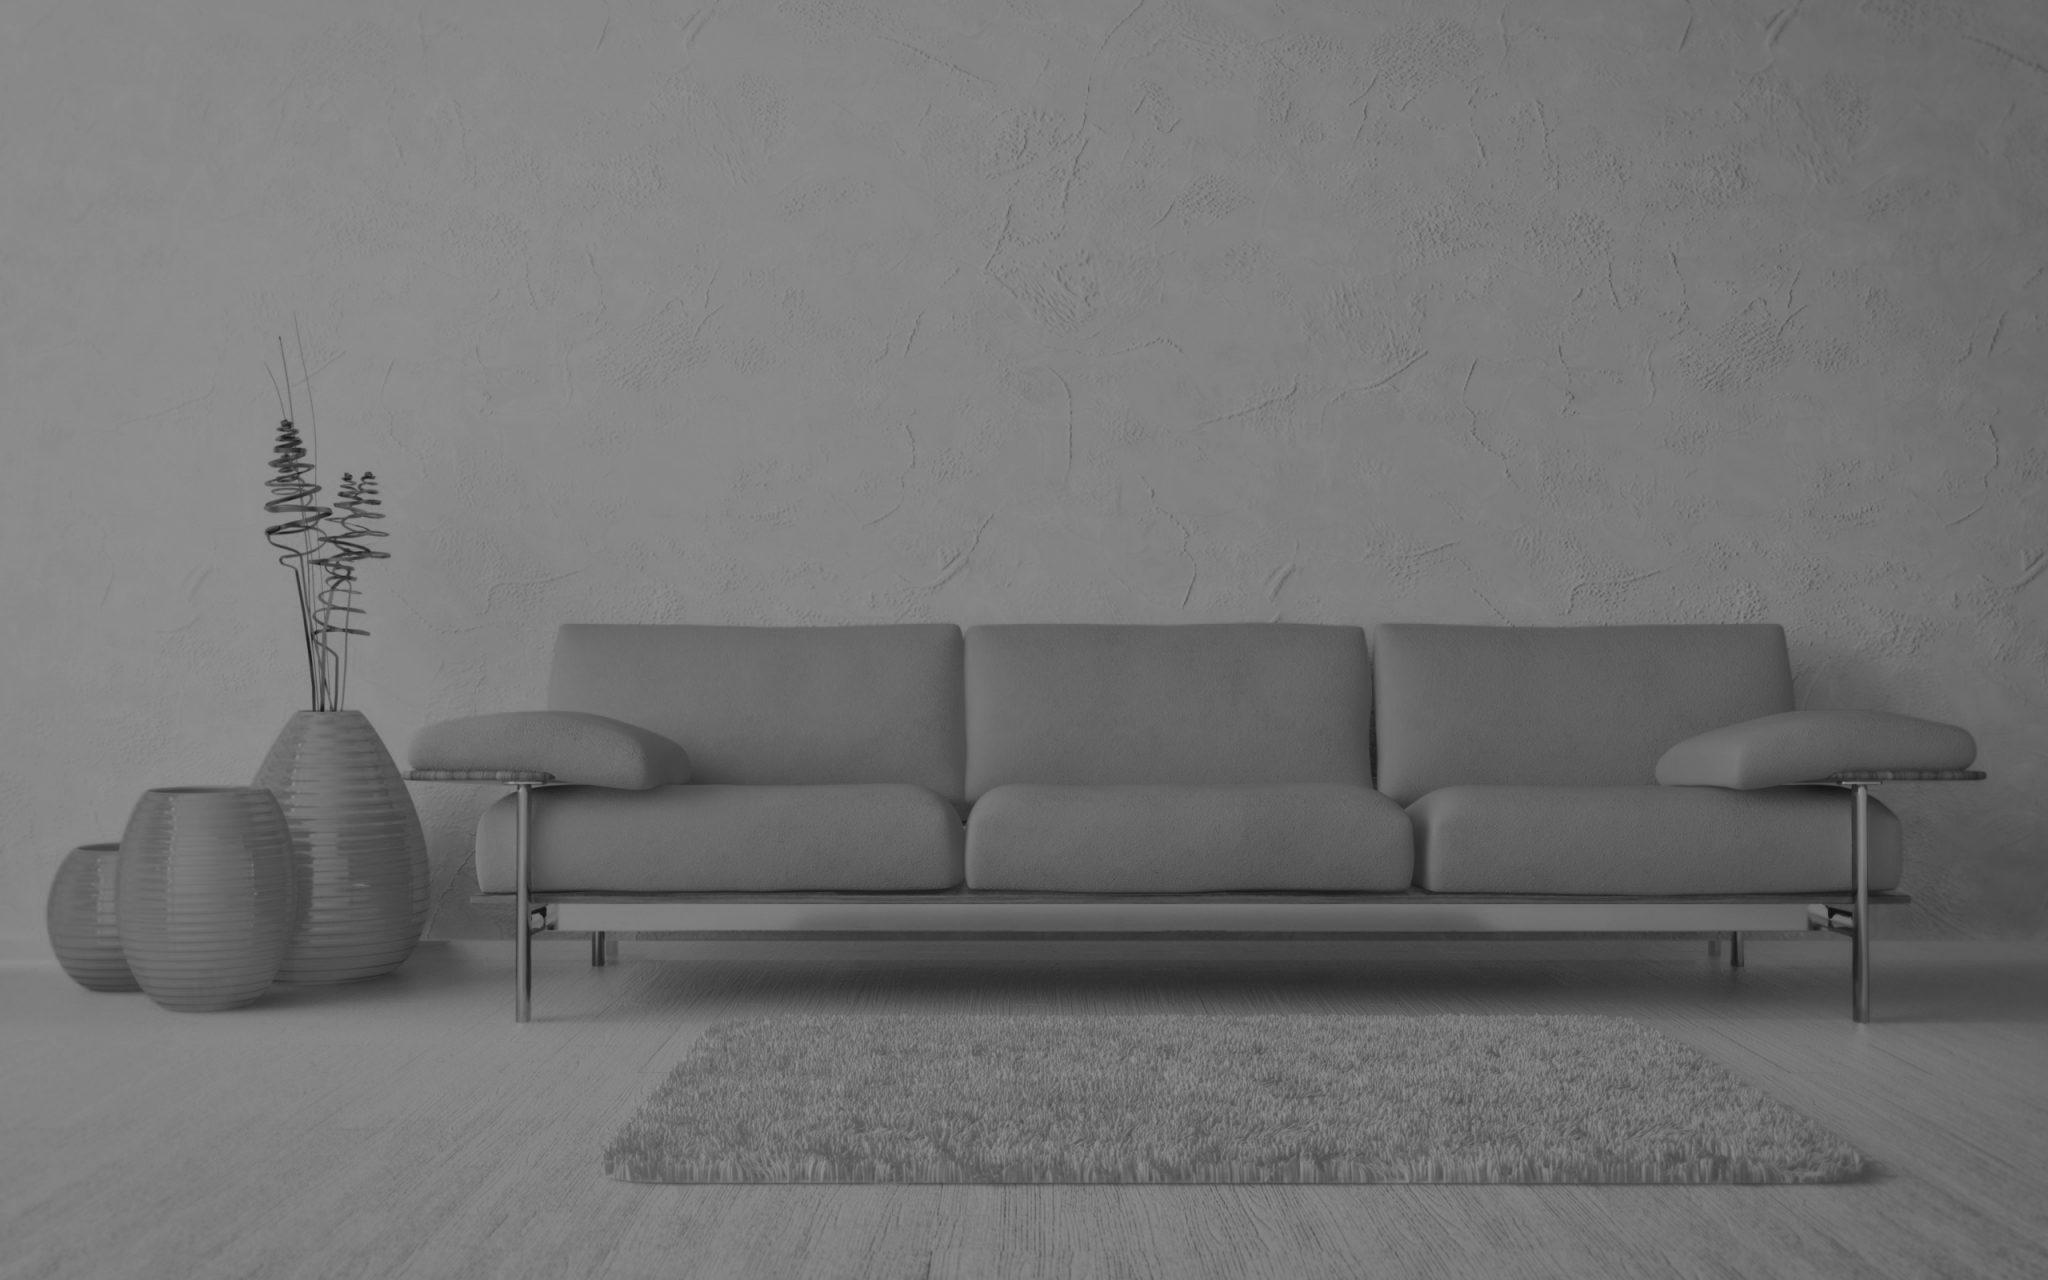 zwart-wit foto sofa